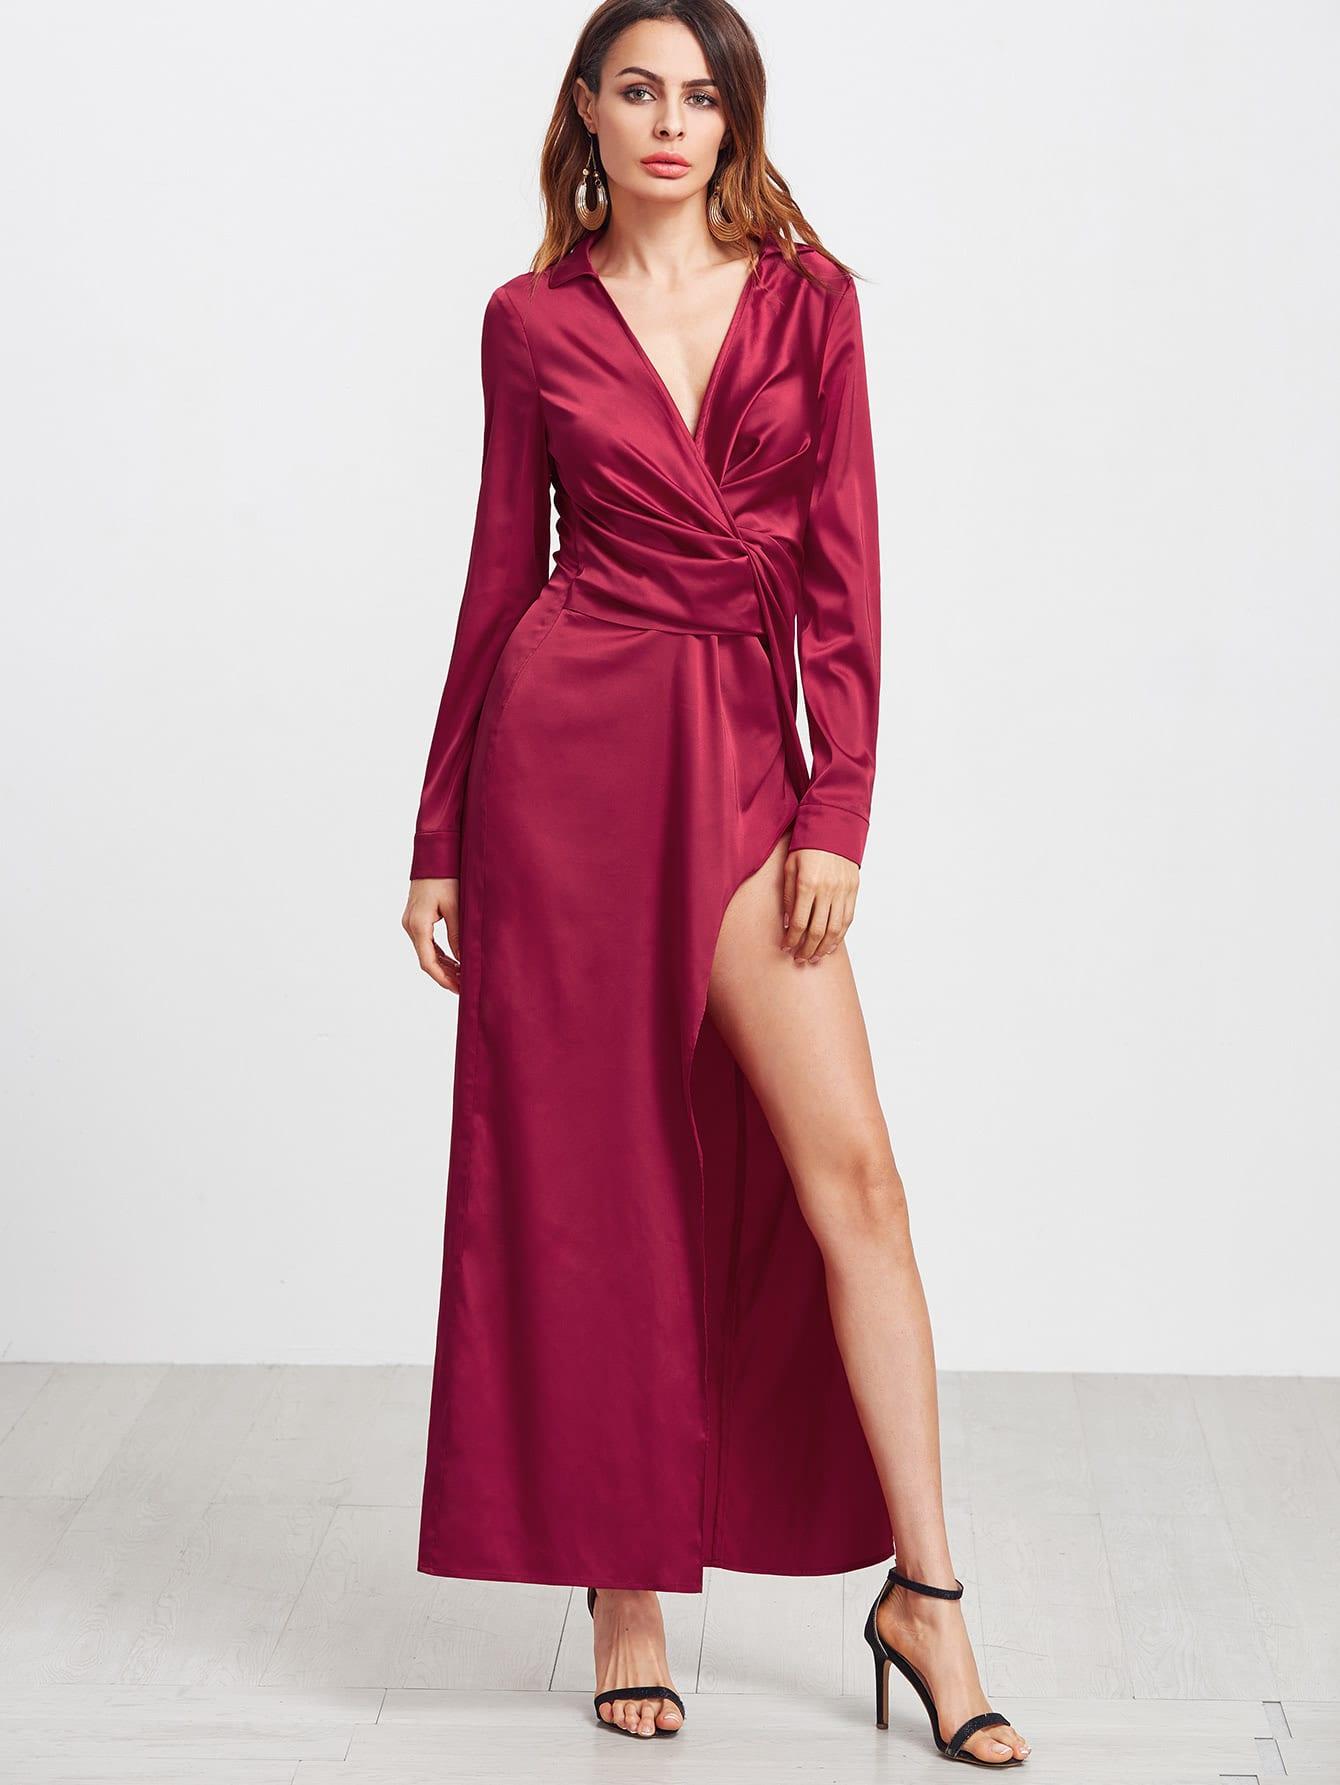 Deep V Neck Twist Front Long Sleeve Dress dress161230703